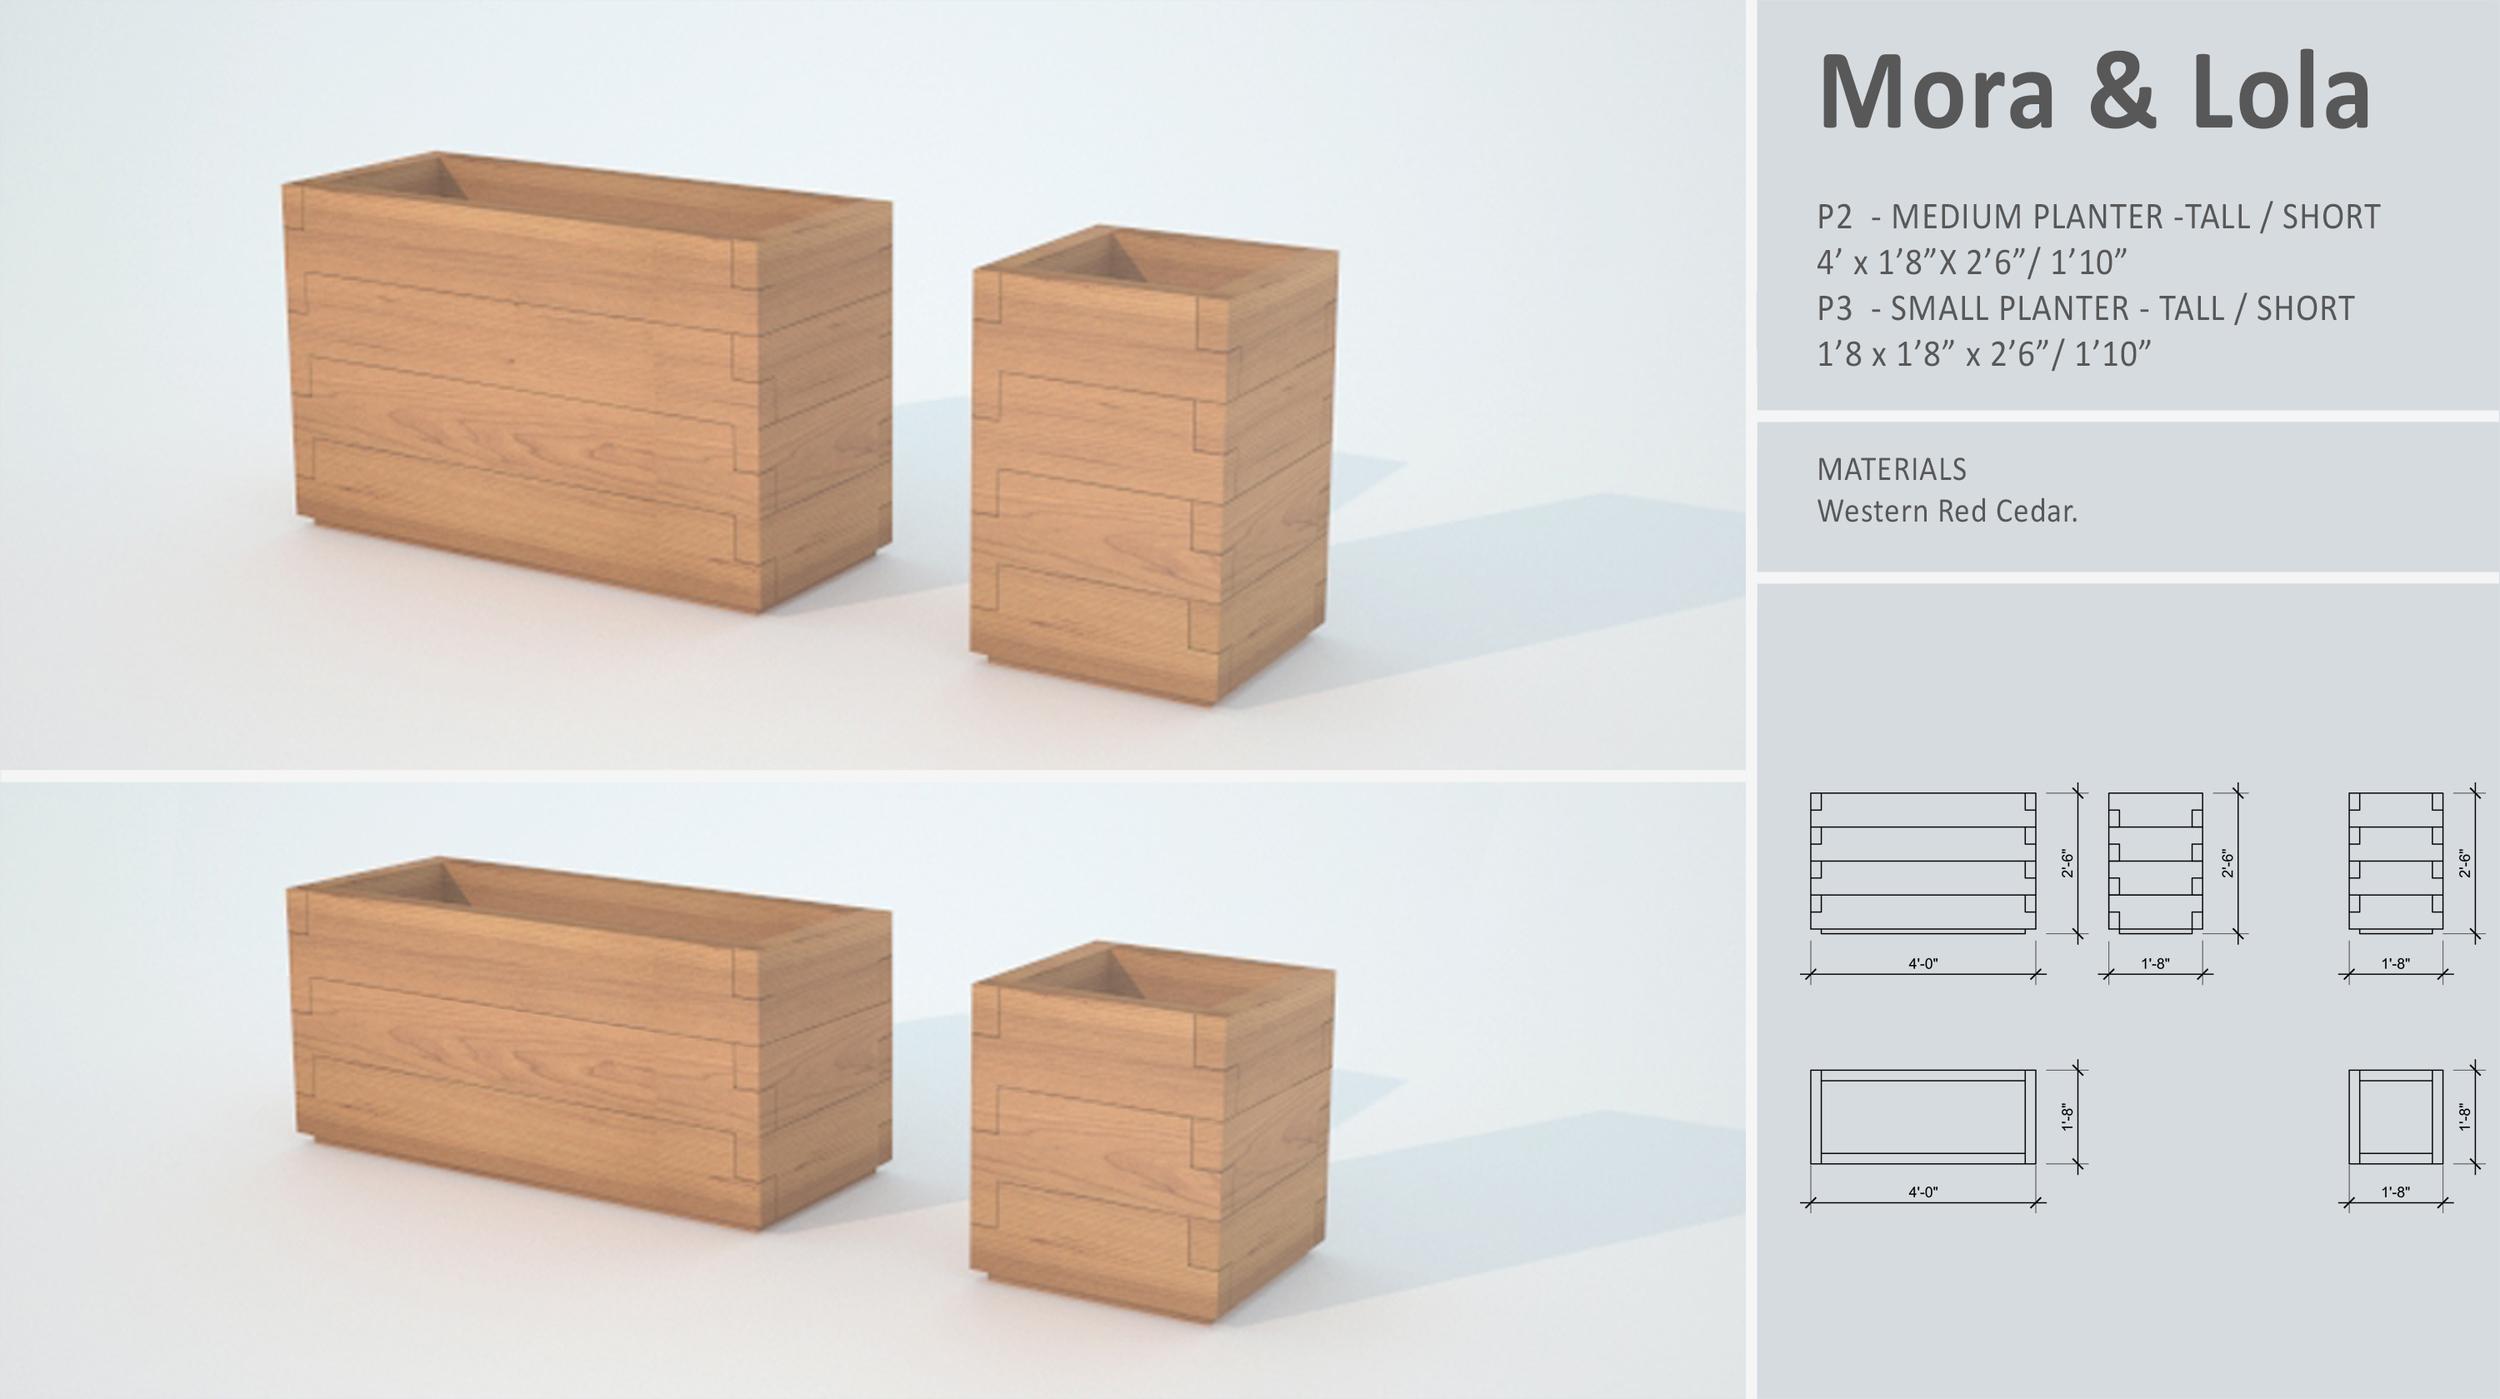 TECHNICAL SHEET PLANTER P2-P3 - MORA & LOLA.jpg